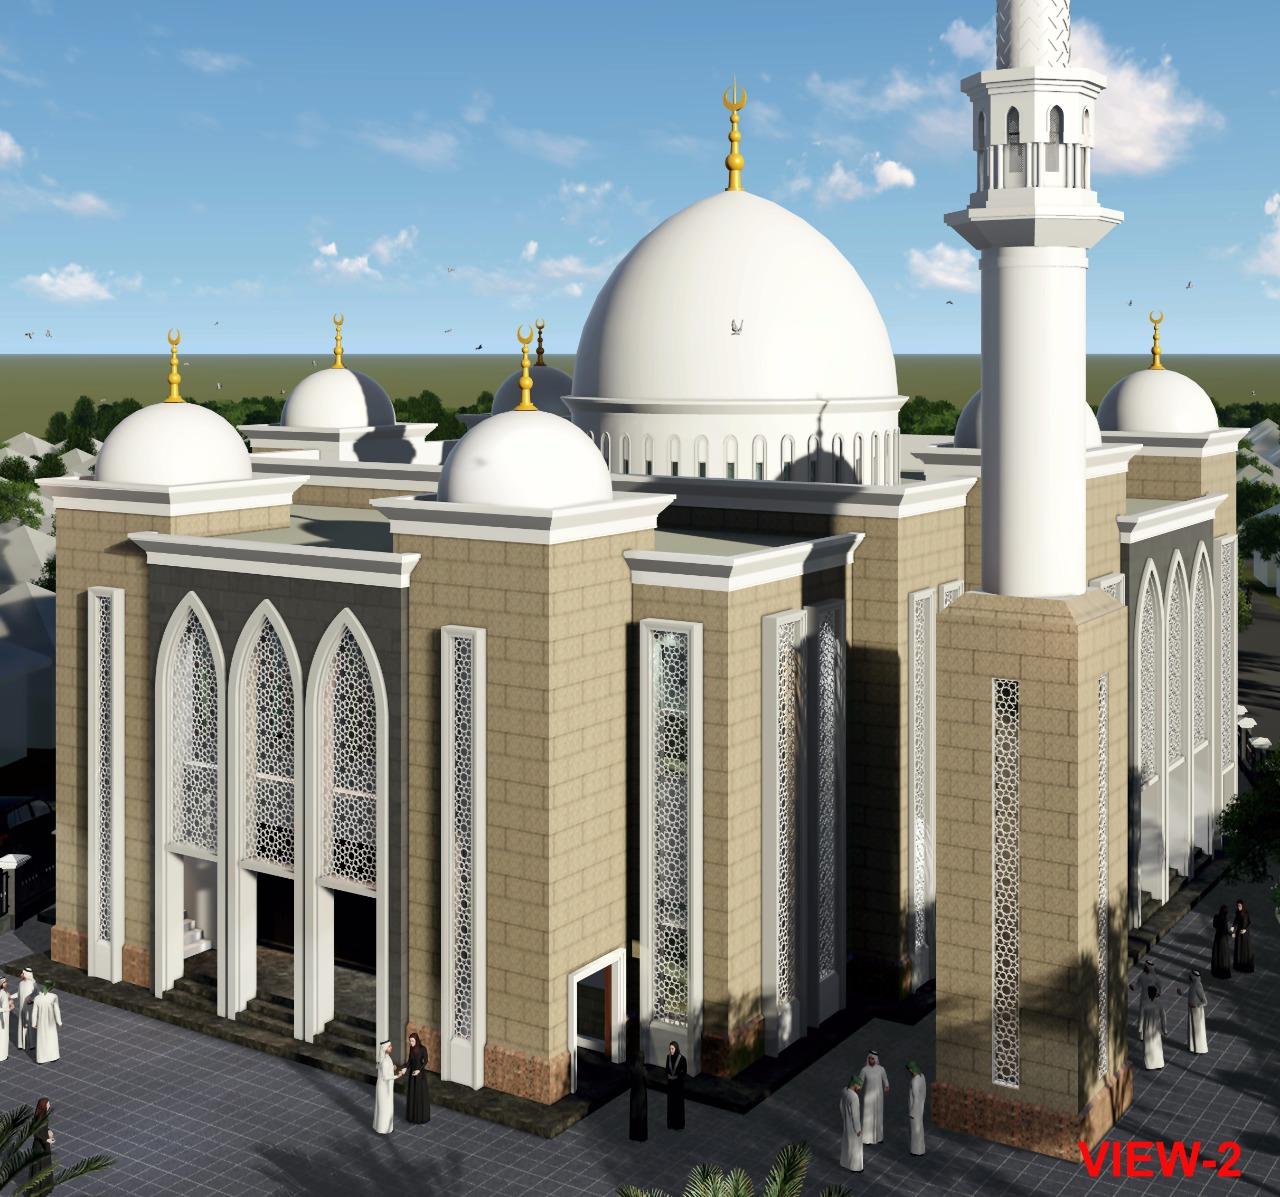 Rencana Pembangunan Masjid Akmaliah